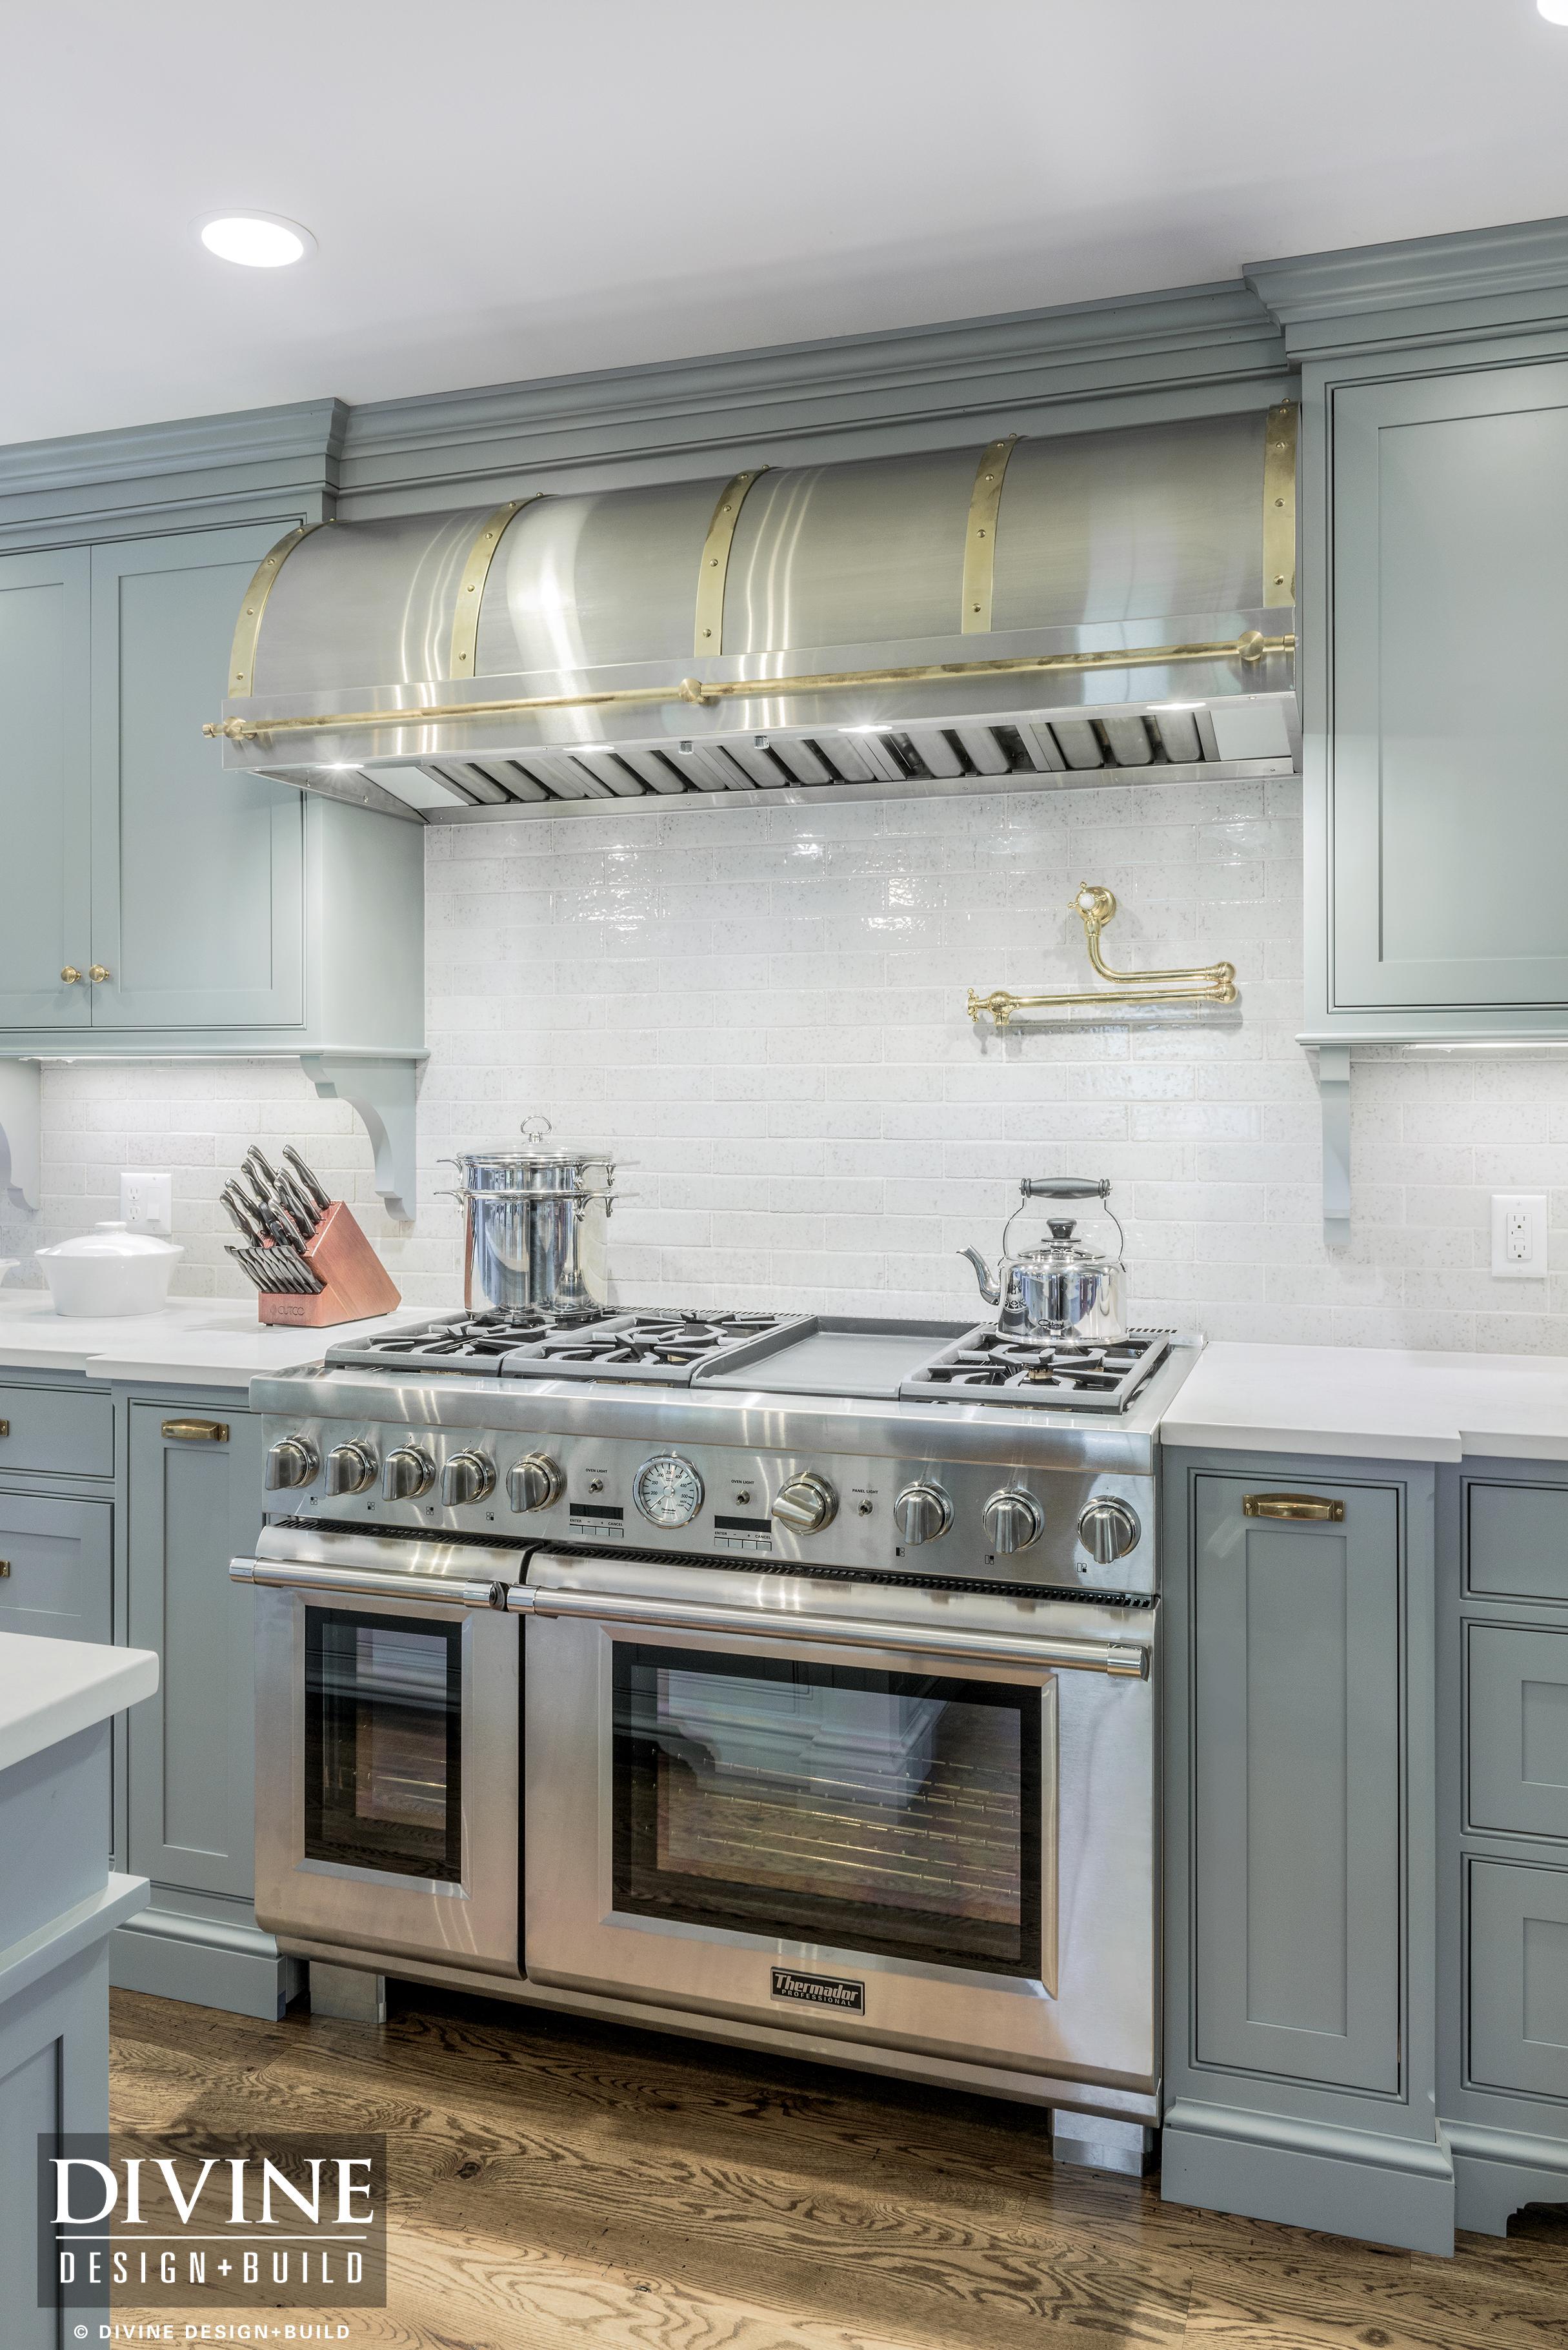 A Guide To Luxury Kitchen Cabinets Divine Design Build